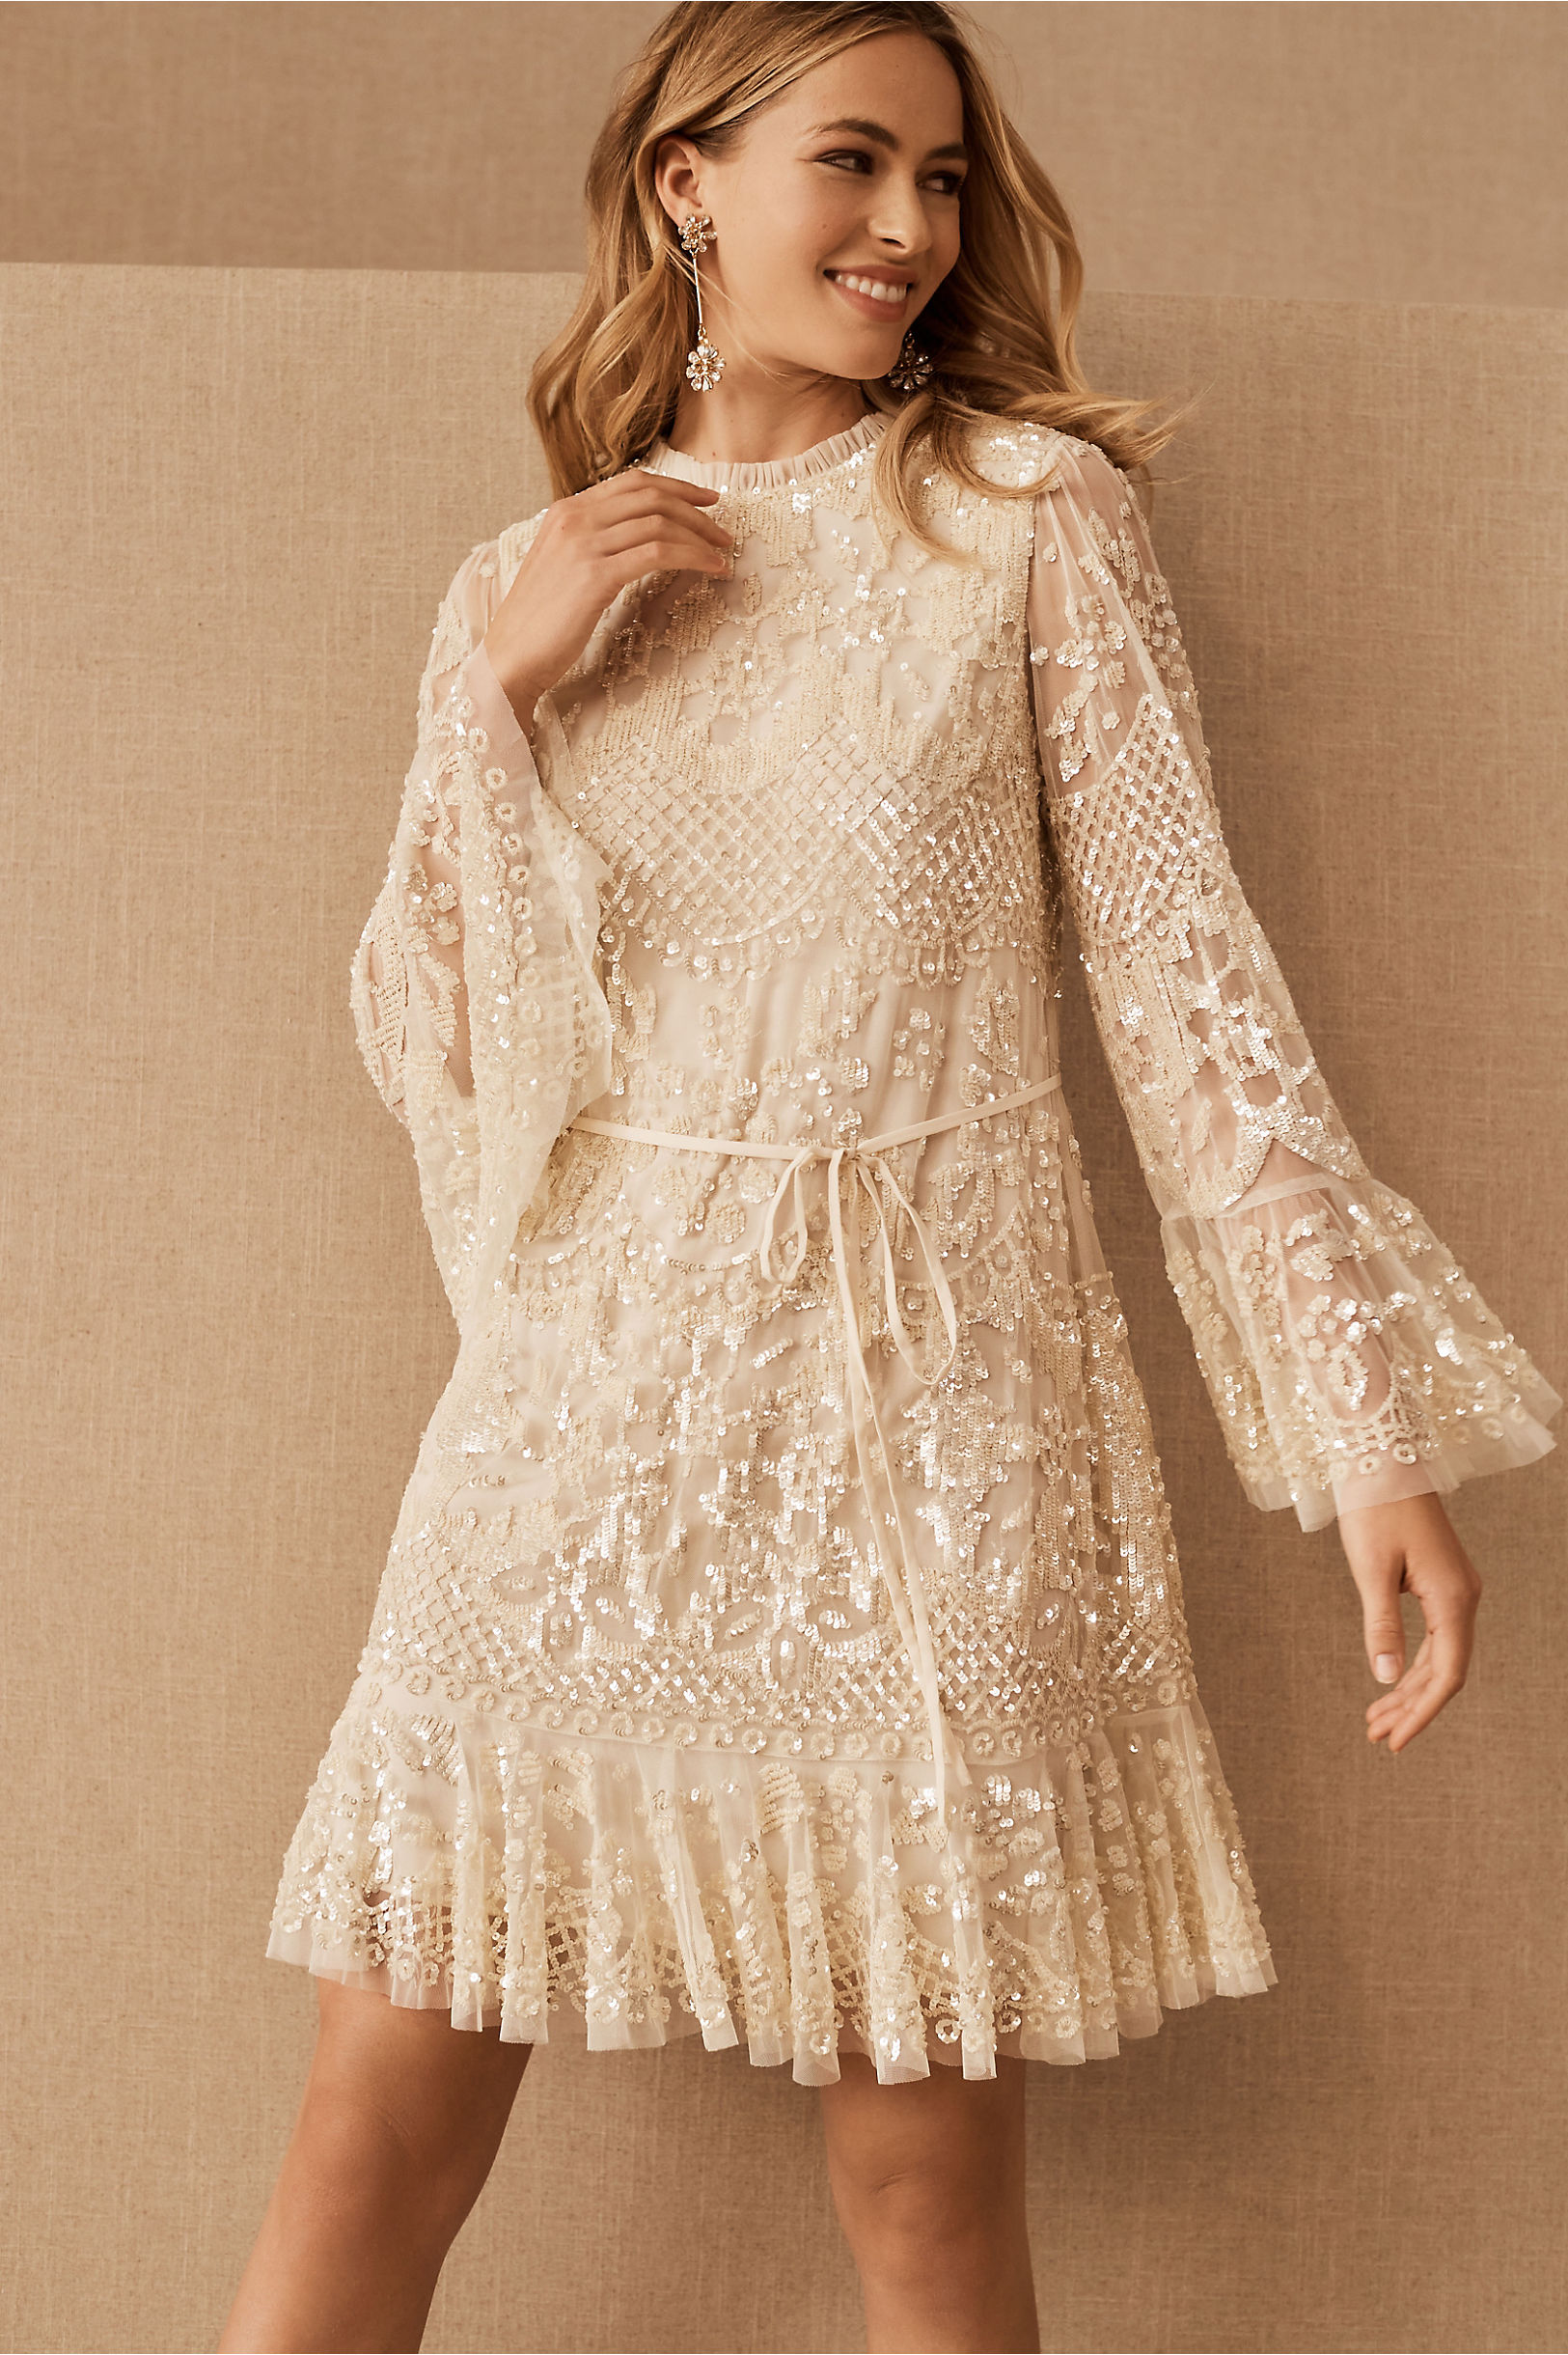 Needle & Thread Snowdrop Mini Dress